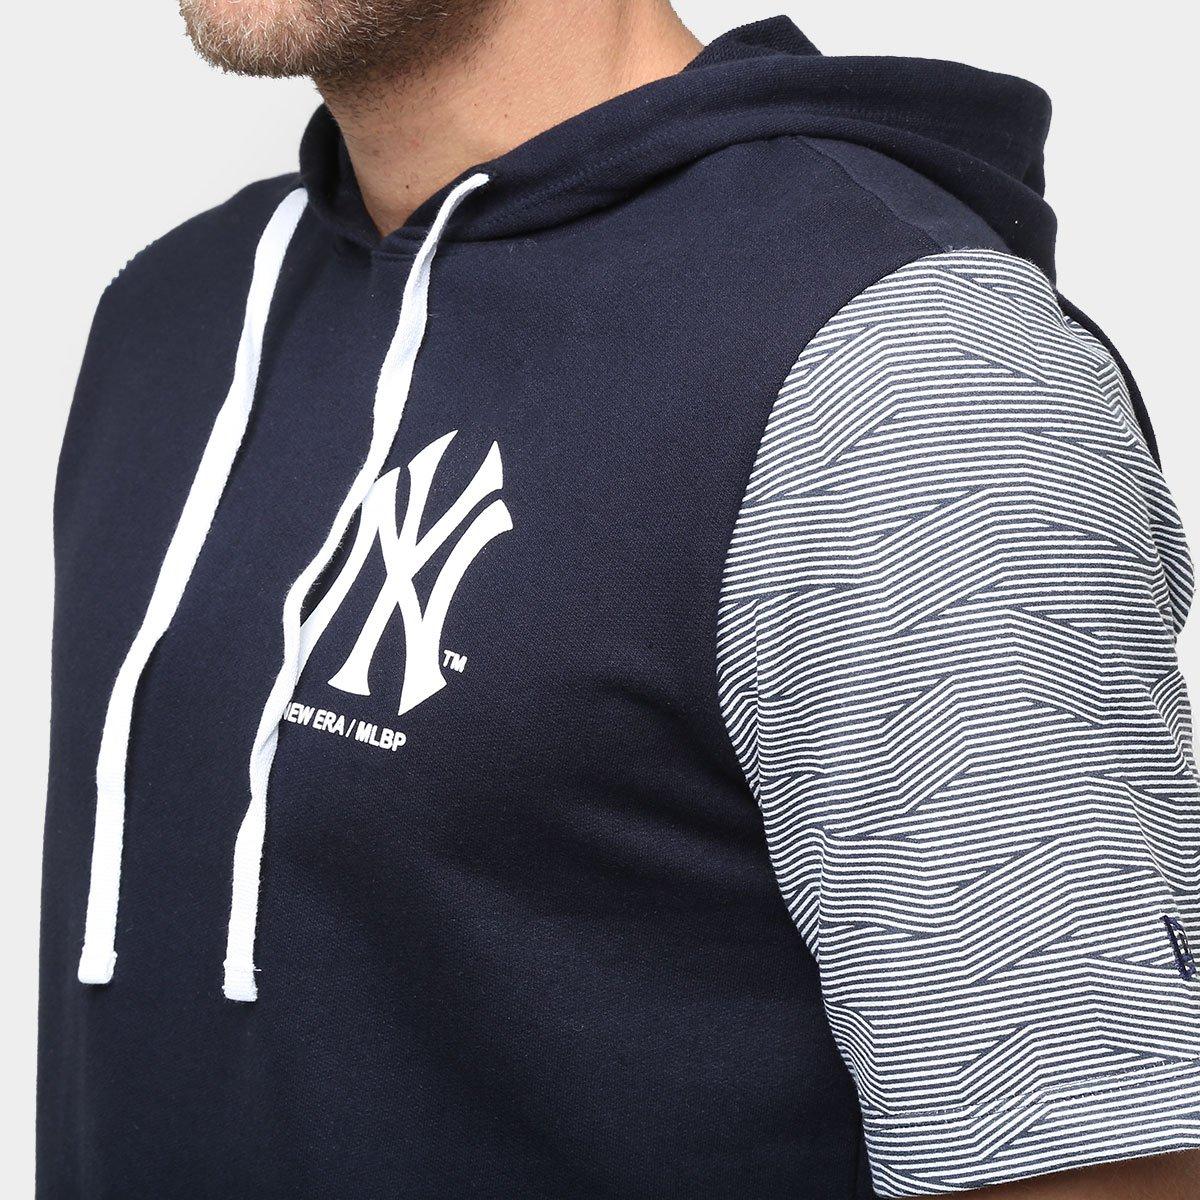 Camiseta New Era MLB De Moletom Geo New York Yankees - Compre Agora ... 93cf2937bb3